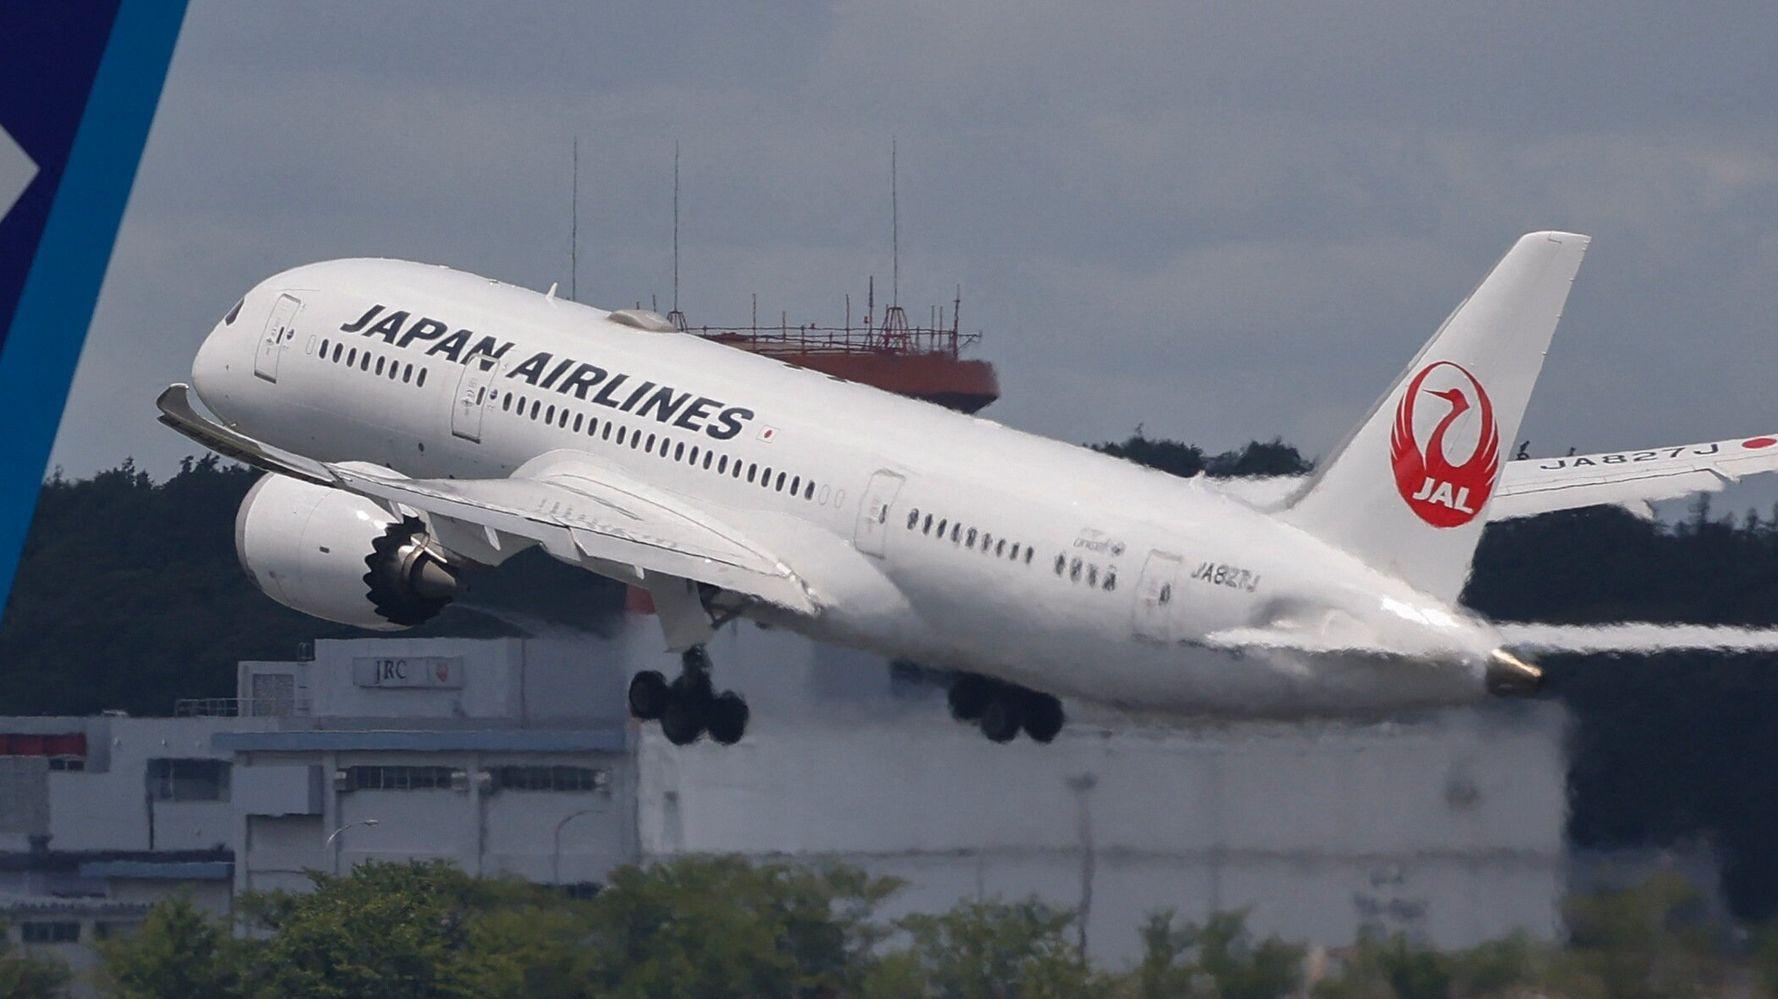 Australian Olympians Investigated For 'Unacceptable Behavior' On Flight Home